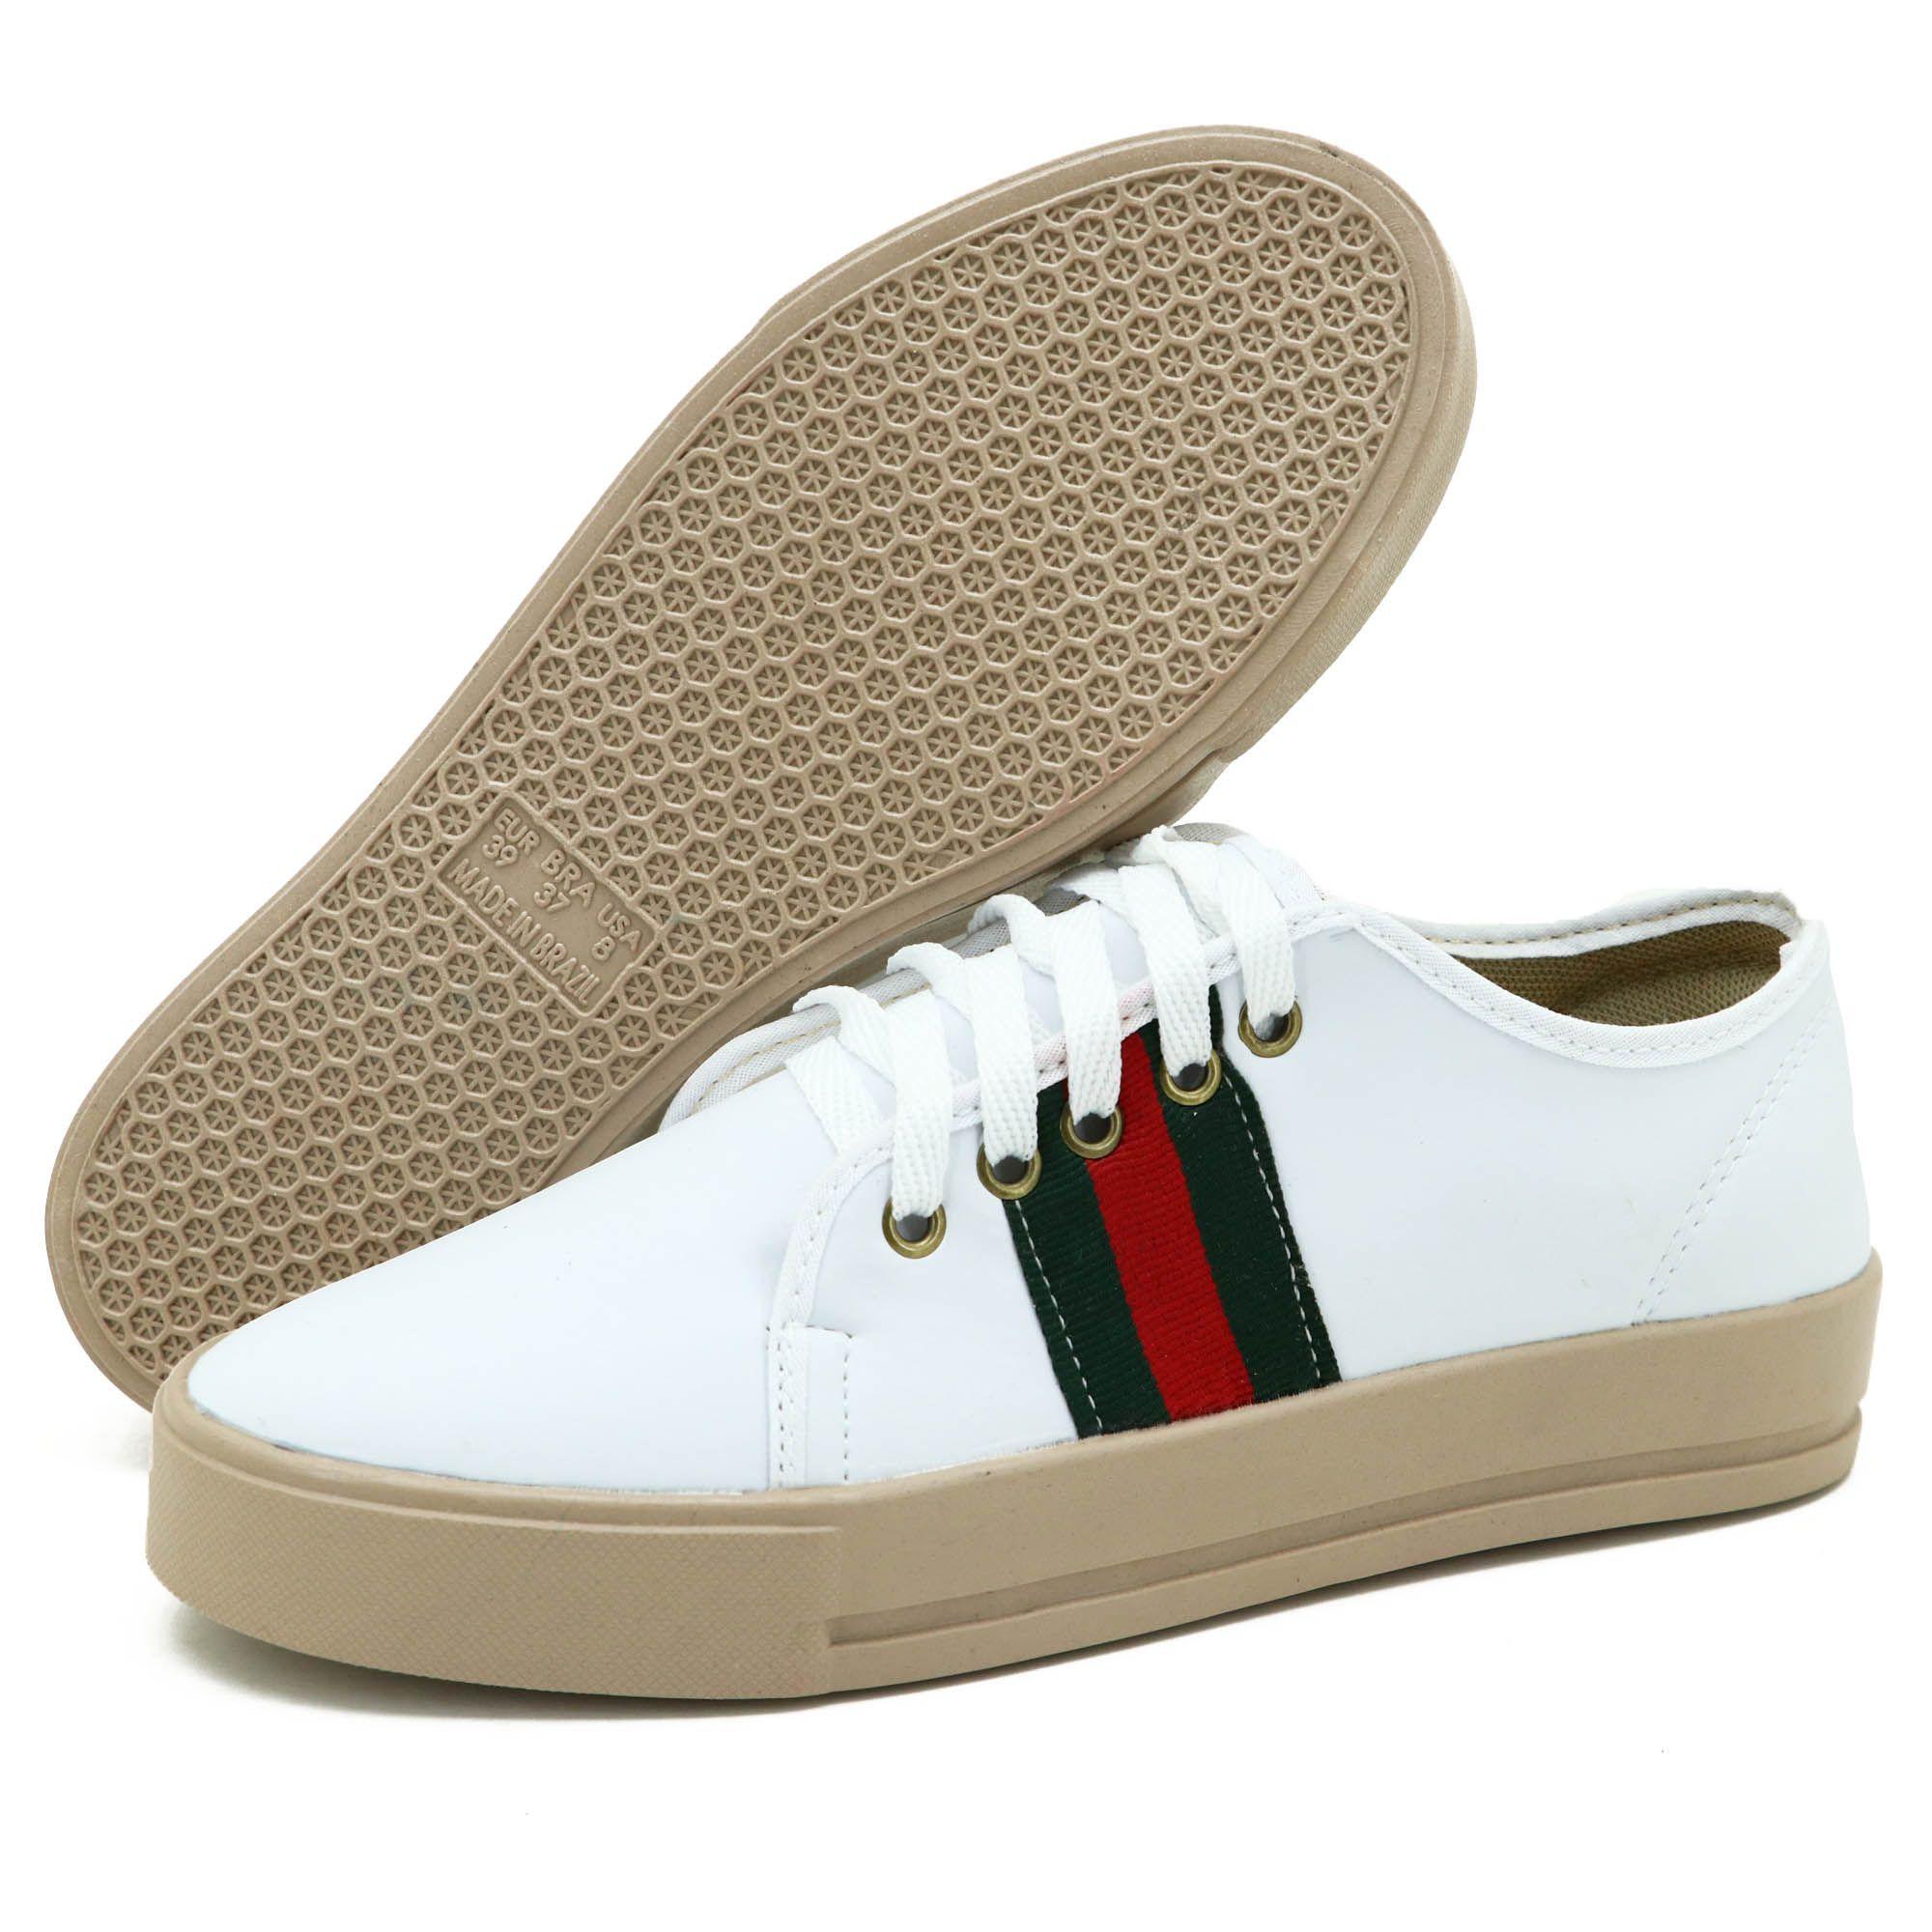 Sapatênis feminino Atron Shoes na cor branca 27000